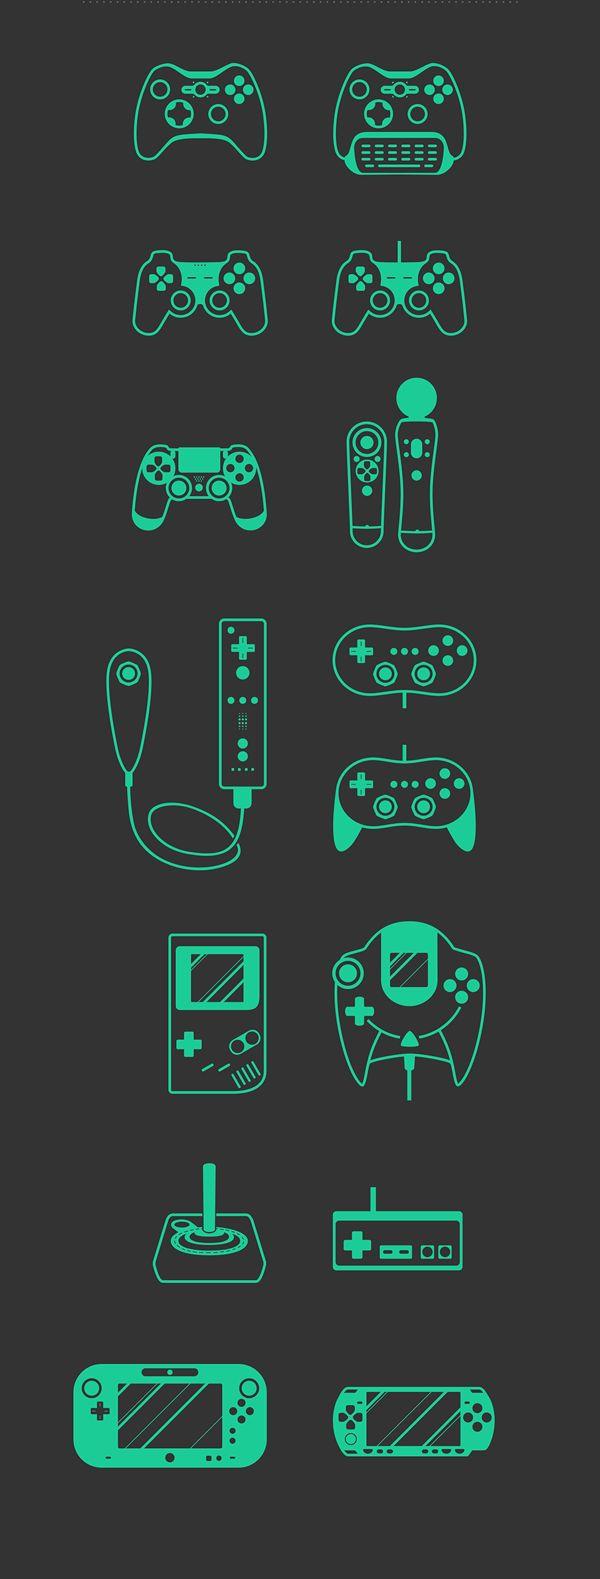 Free Game Set by Radoslav Krumov, via Behance#Minimalist #Illustration #icon